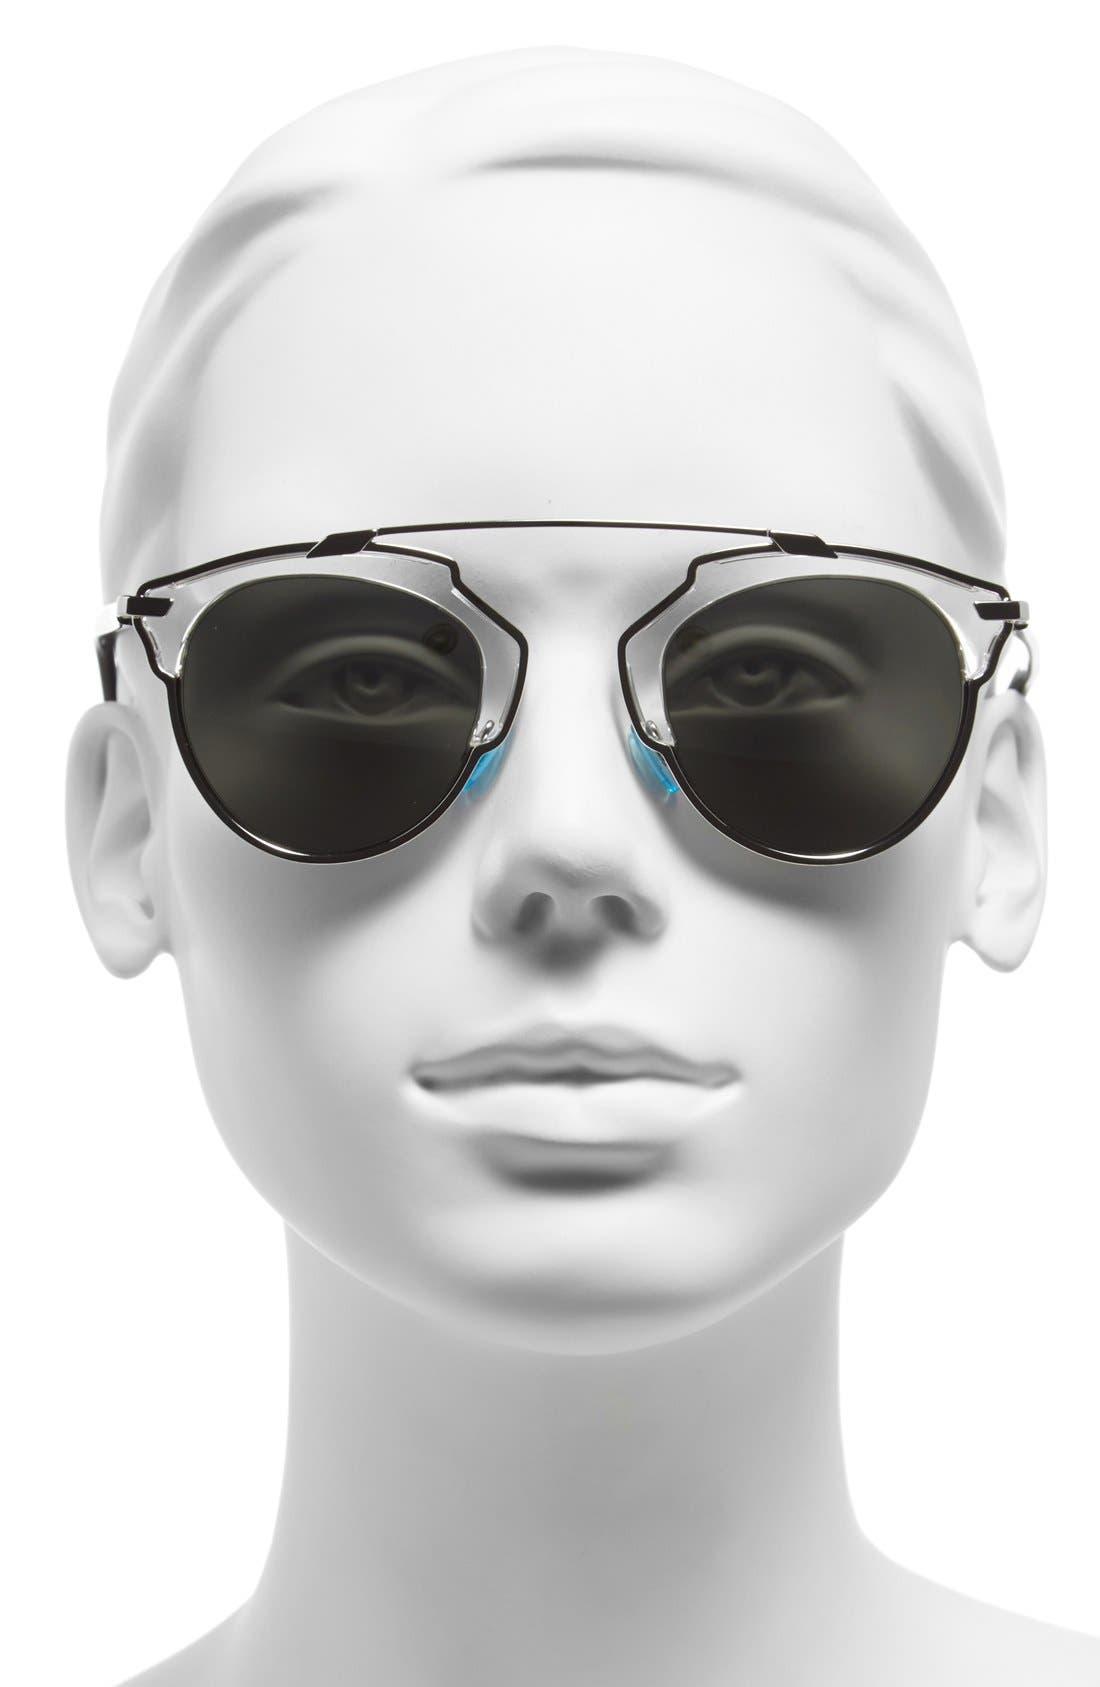 So Real 48mm Brow Bar Sunglasses,                             Alternate thumbnail 34, color,